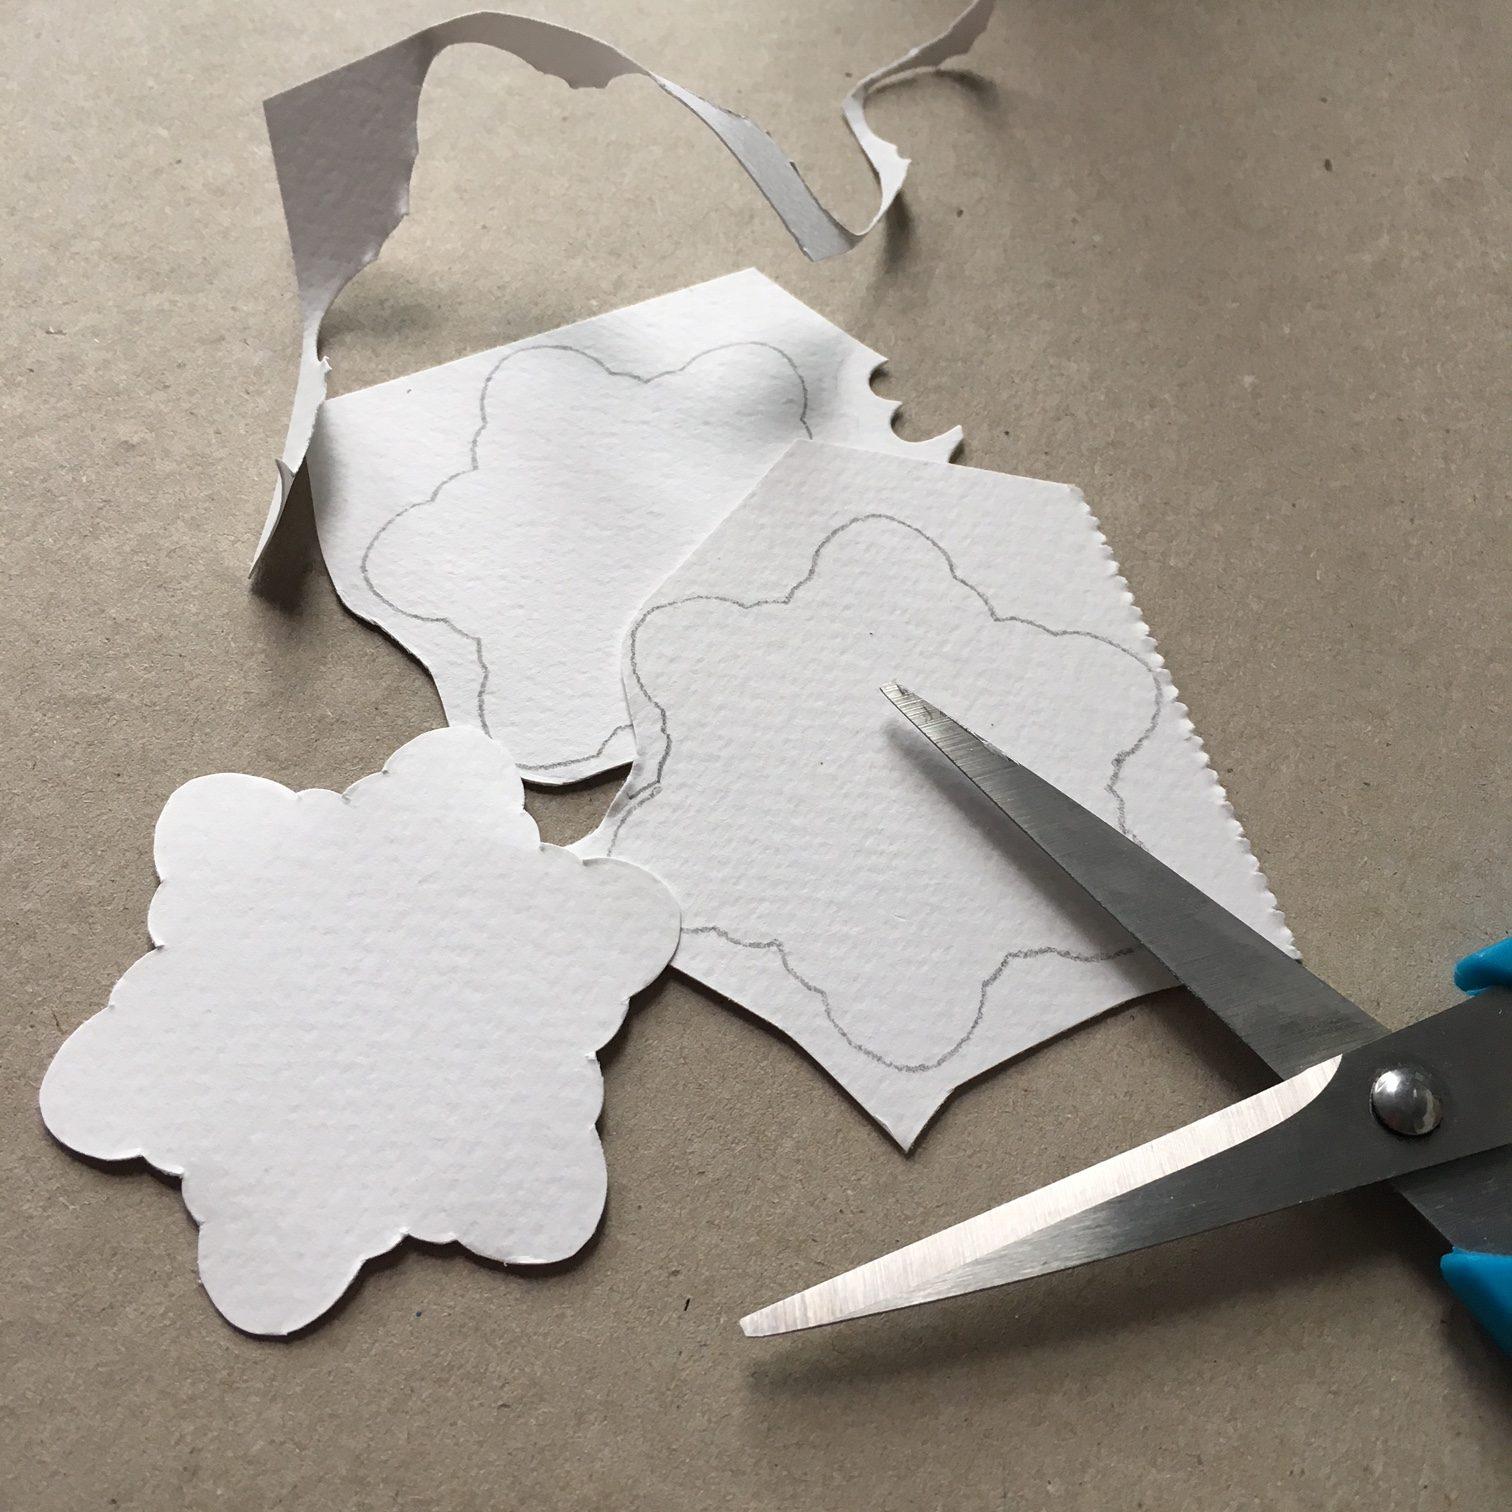 scissors and paper snowflake shape cut